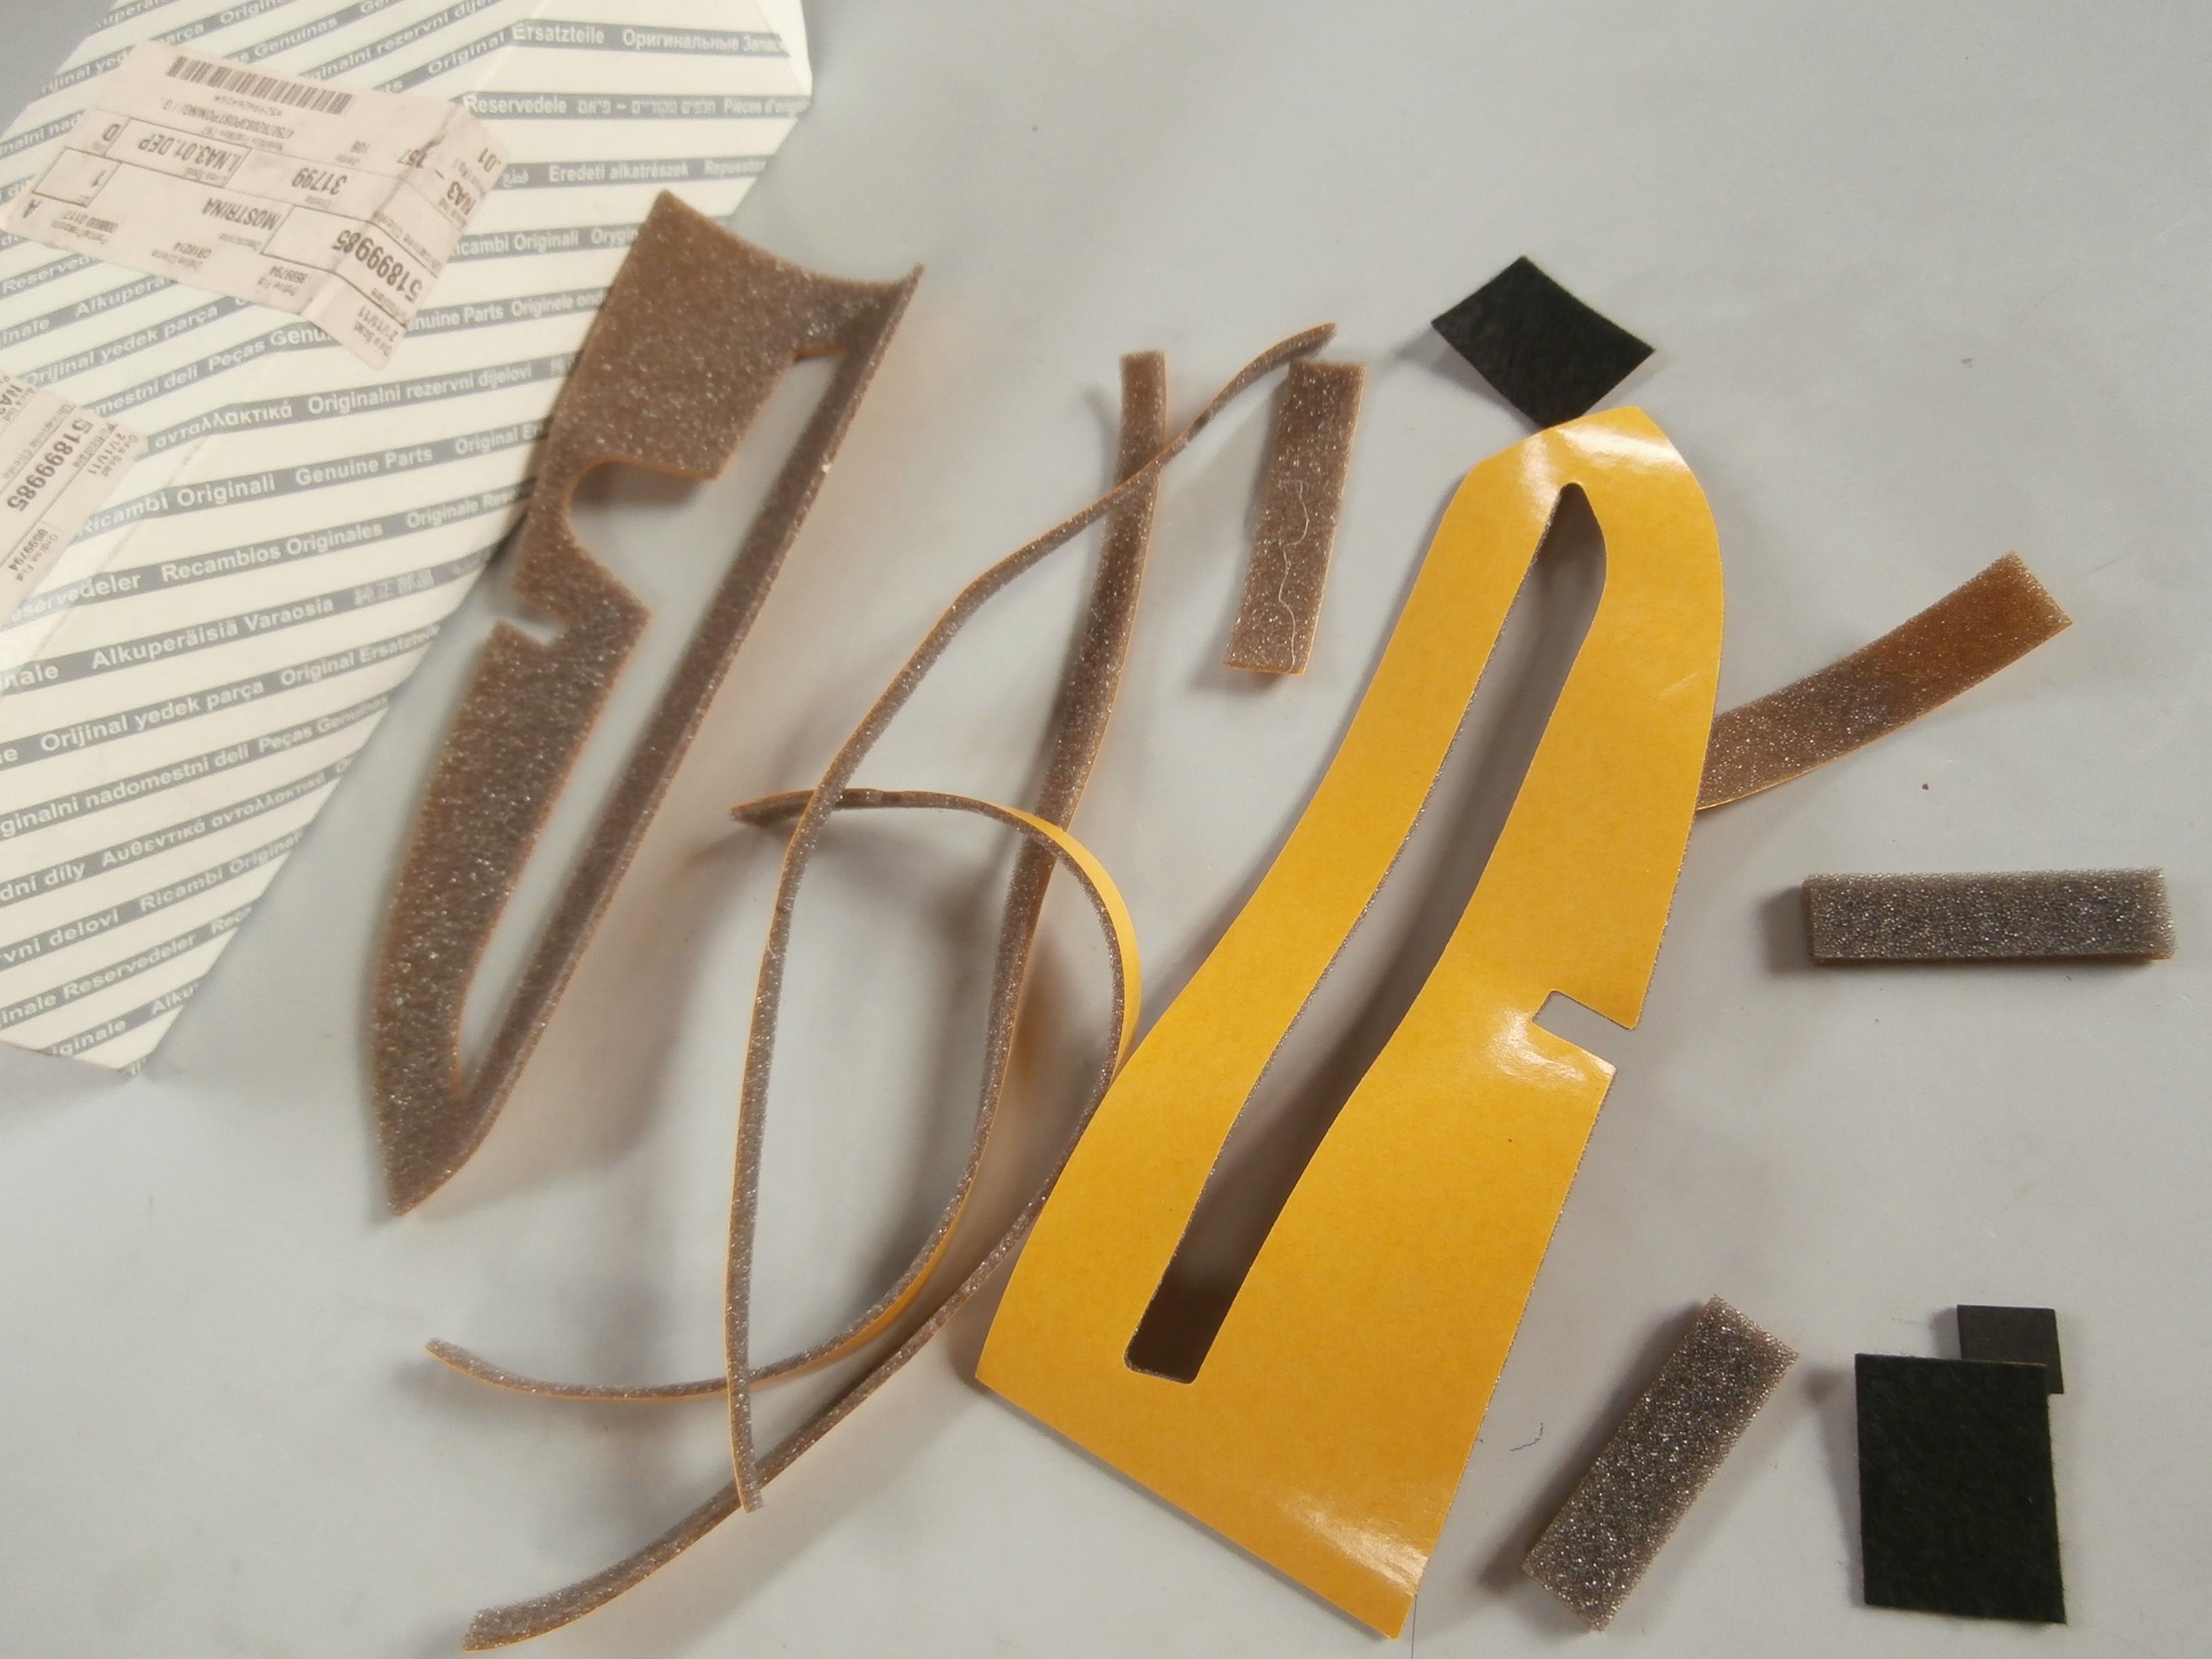 51899985 dashboard trim lancia ypsilon ebay. Black Bedroom Furniture Sets. Home Design Ideas